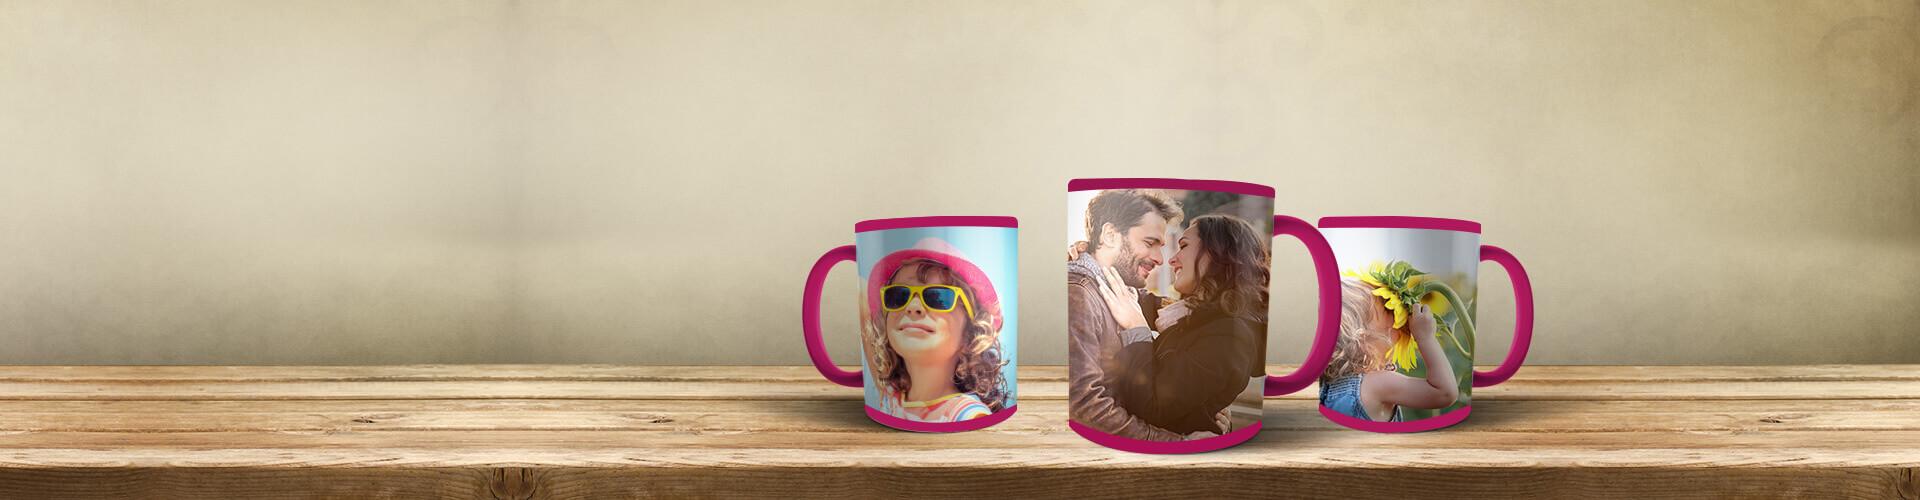 Photo Printing a Mug Just Became Easy for You!